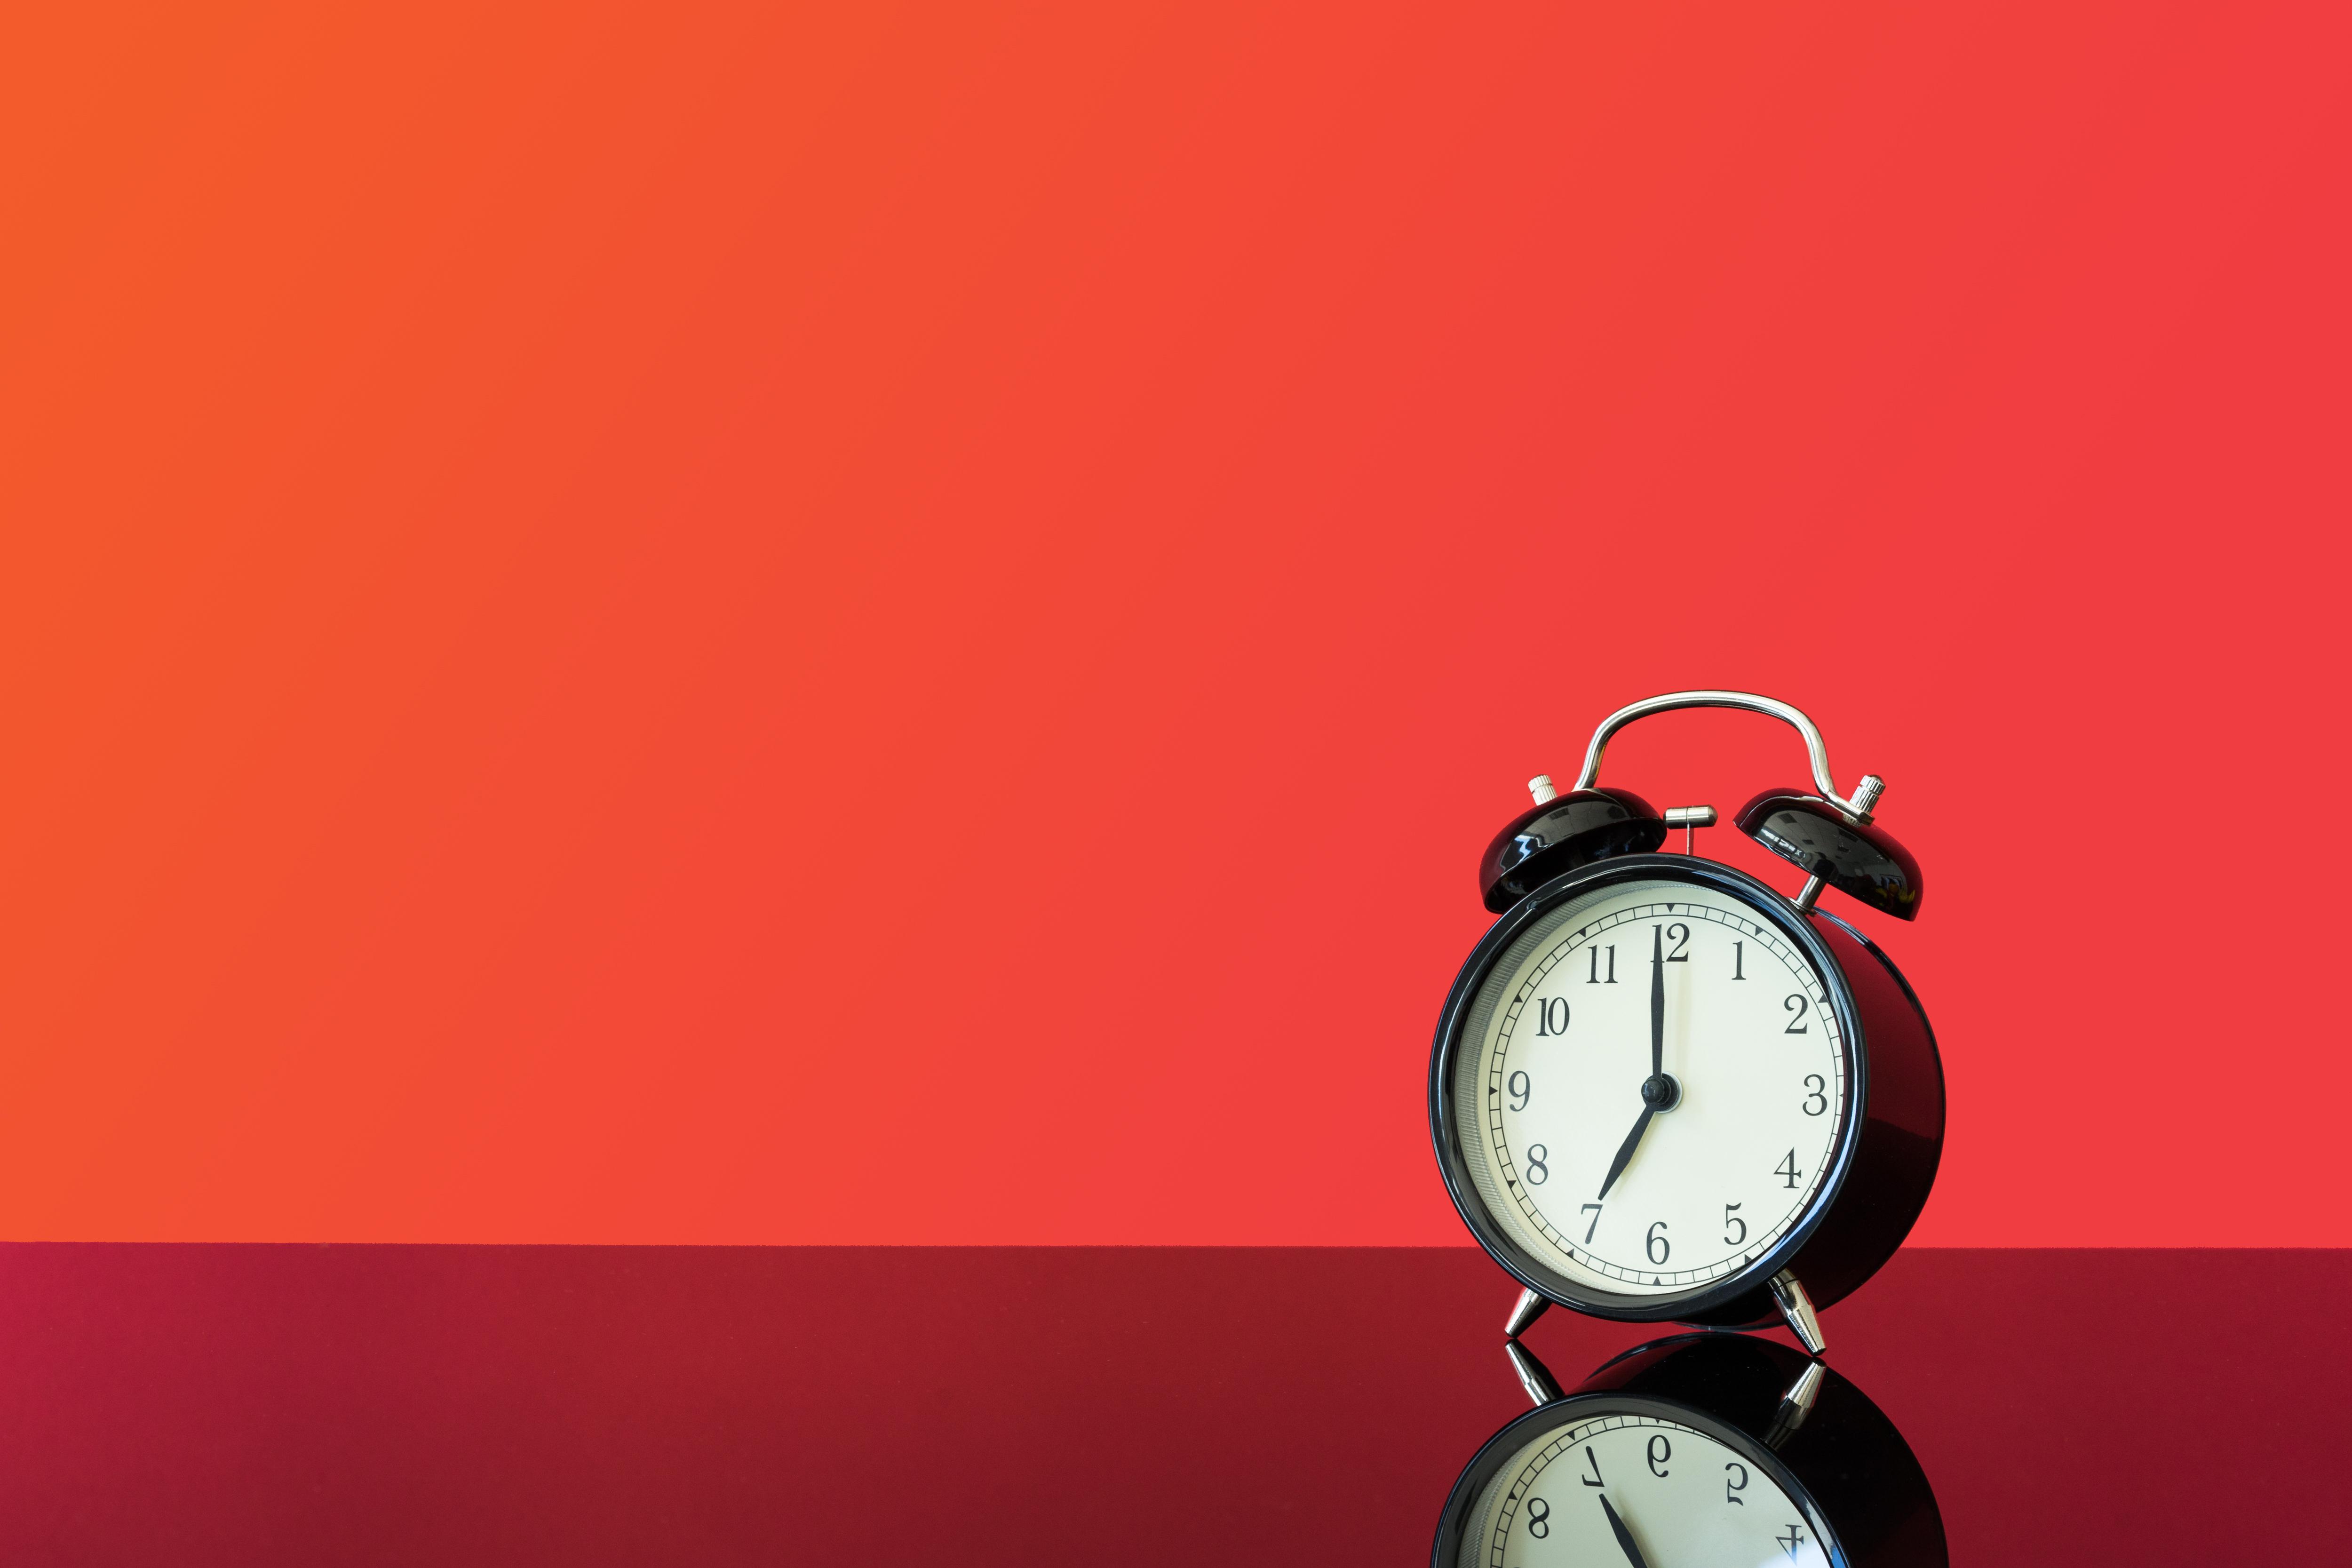 vintage-alarm-clock-picjumbo-com